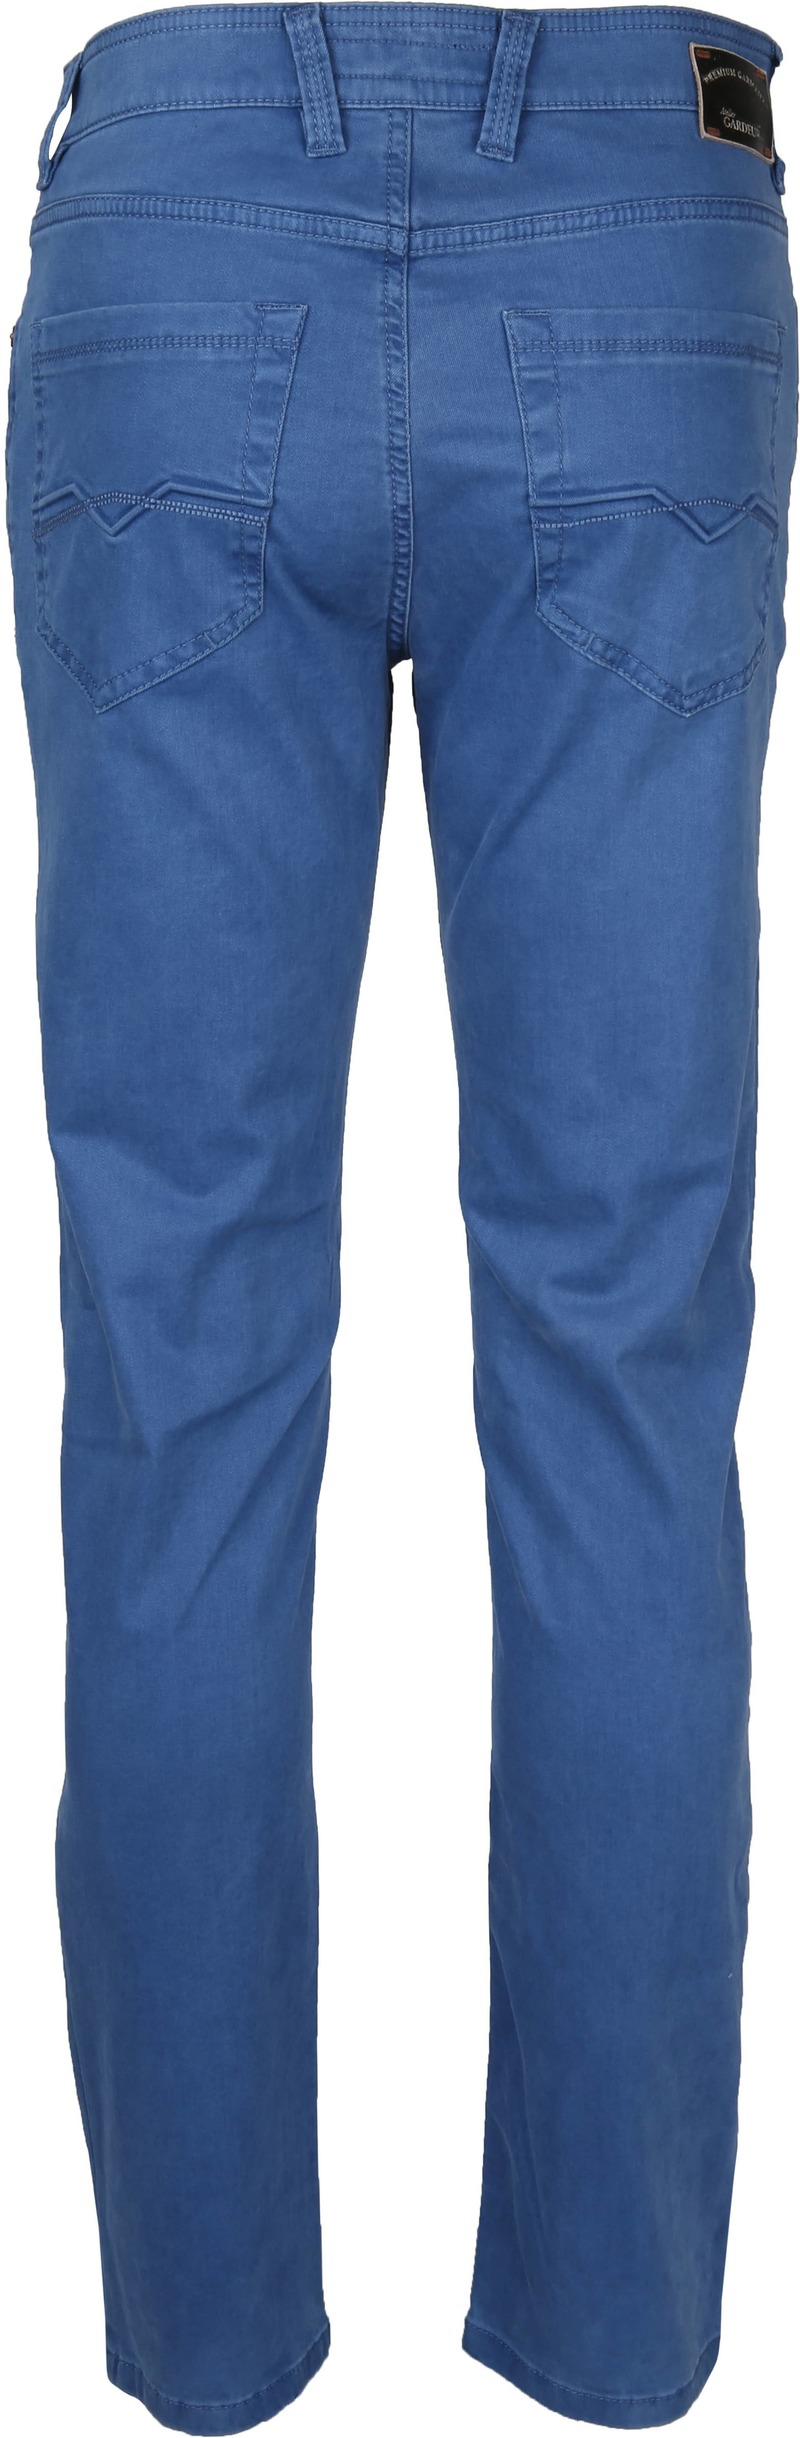 Gardeur Batu Pants Blue photo 3